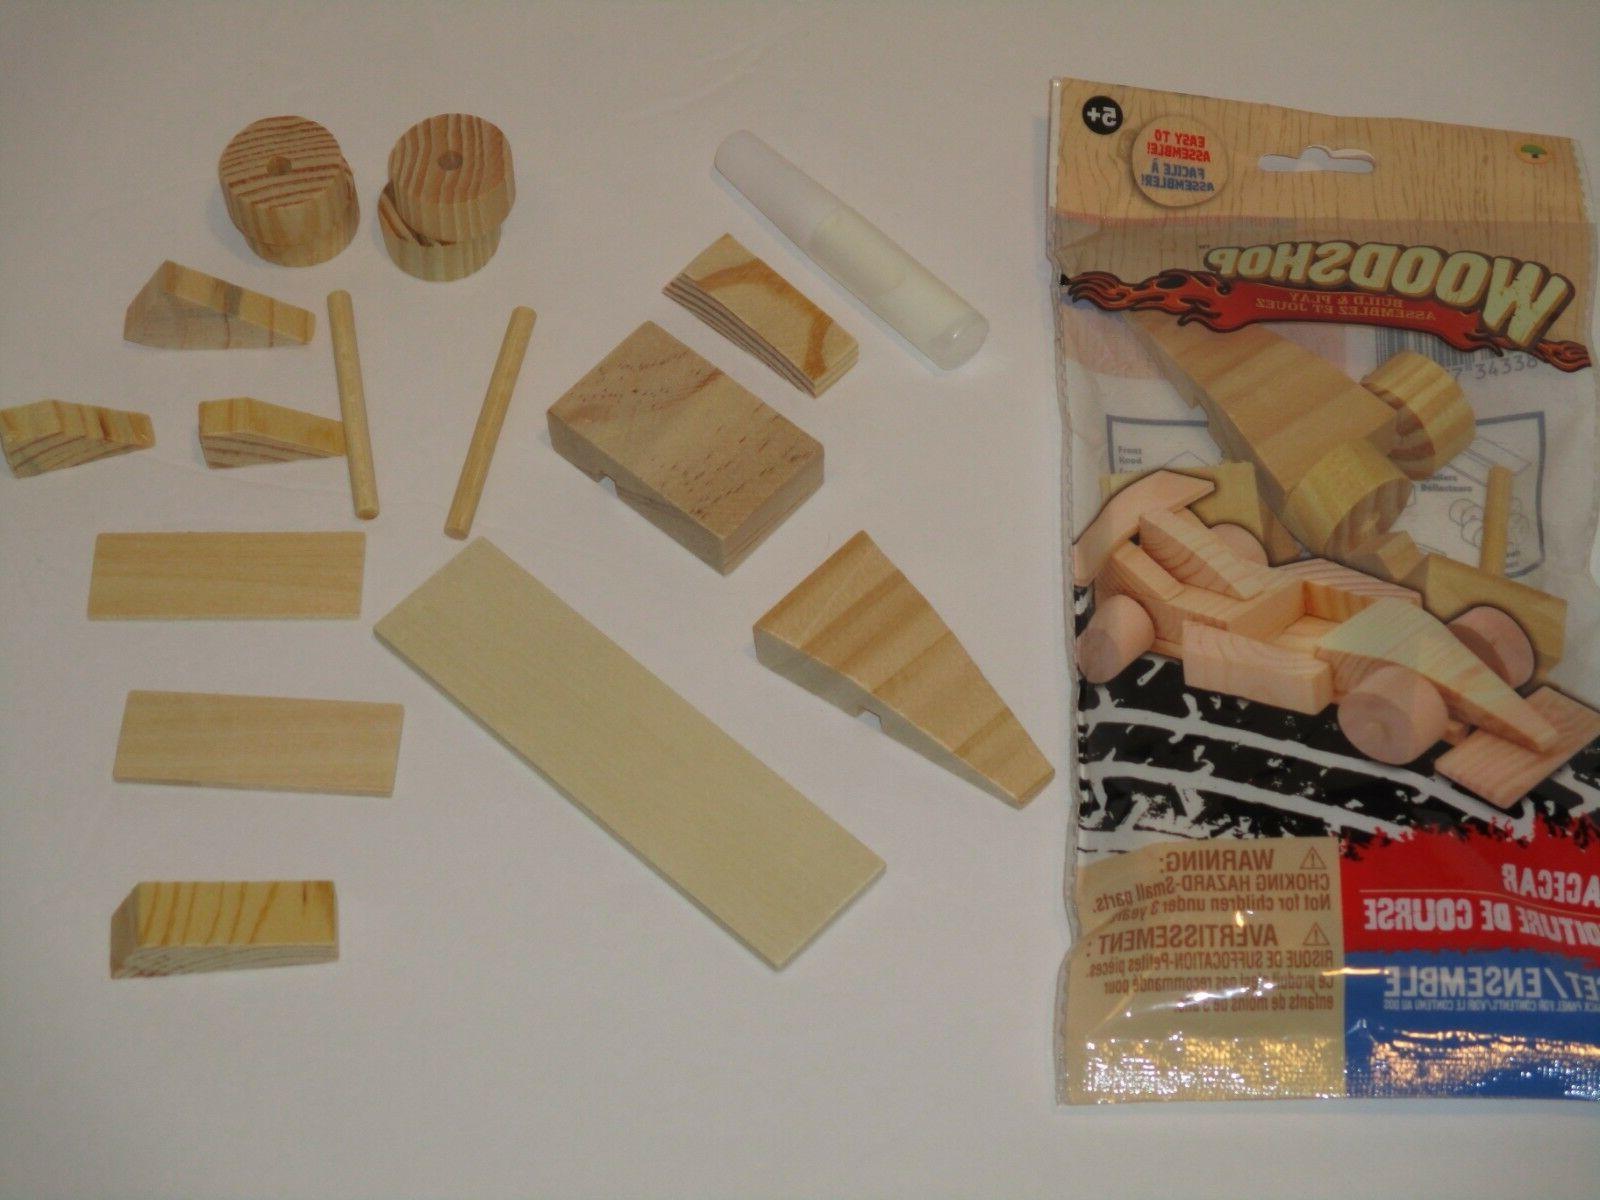 Wood Shop Model Kit - Build Wooden Toy,